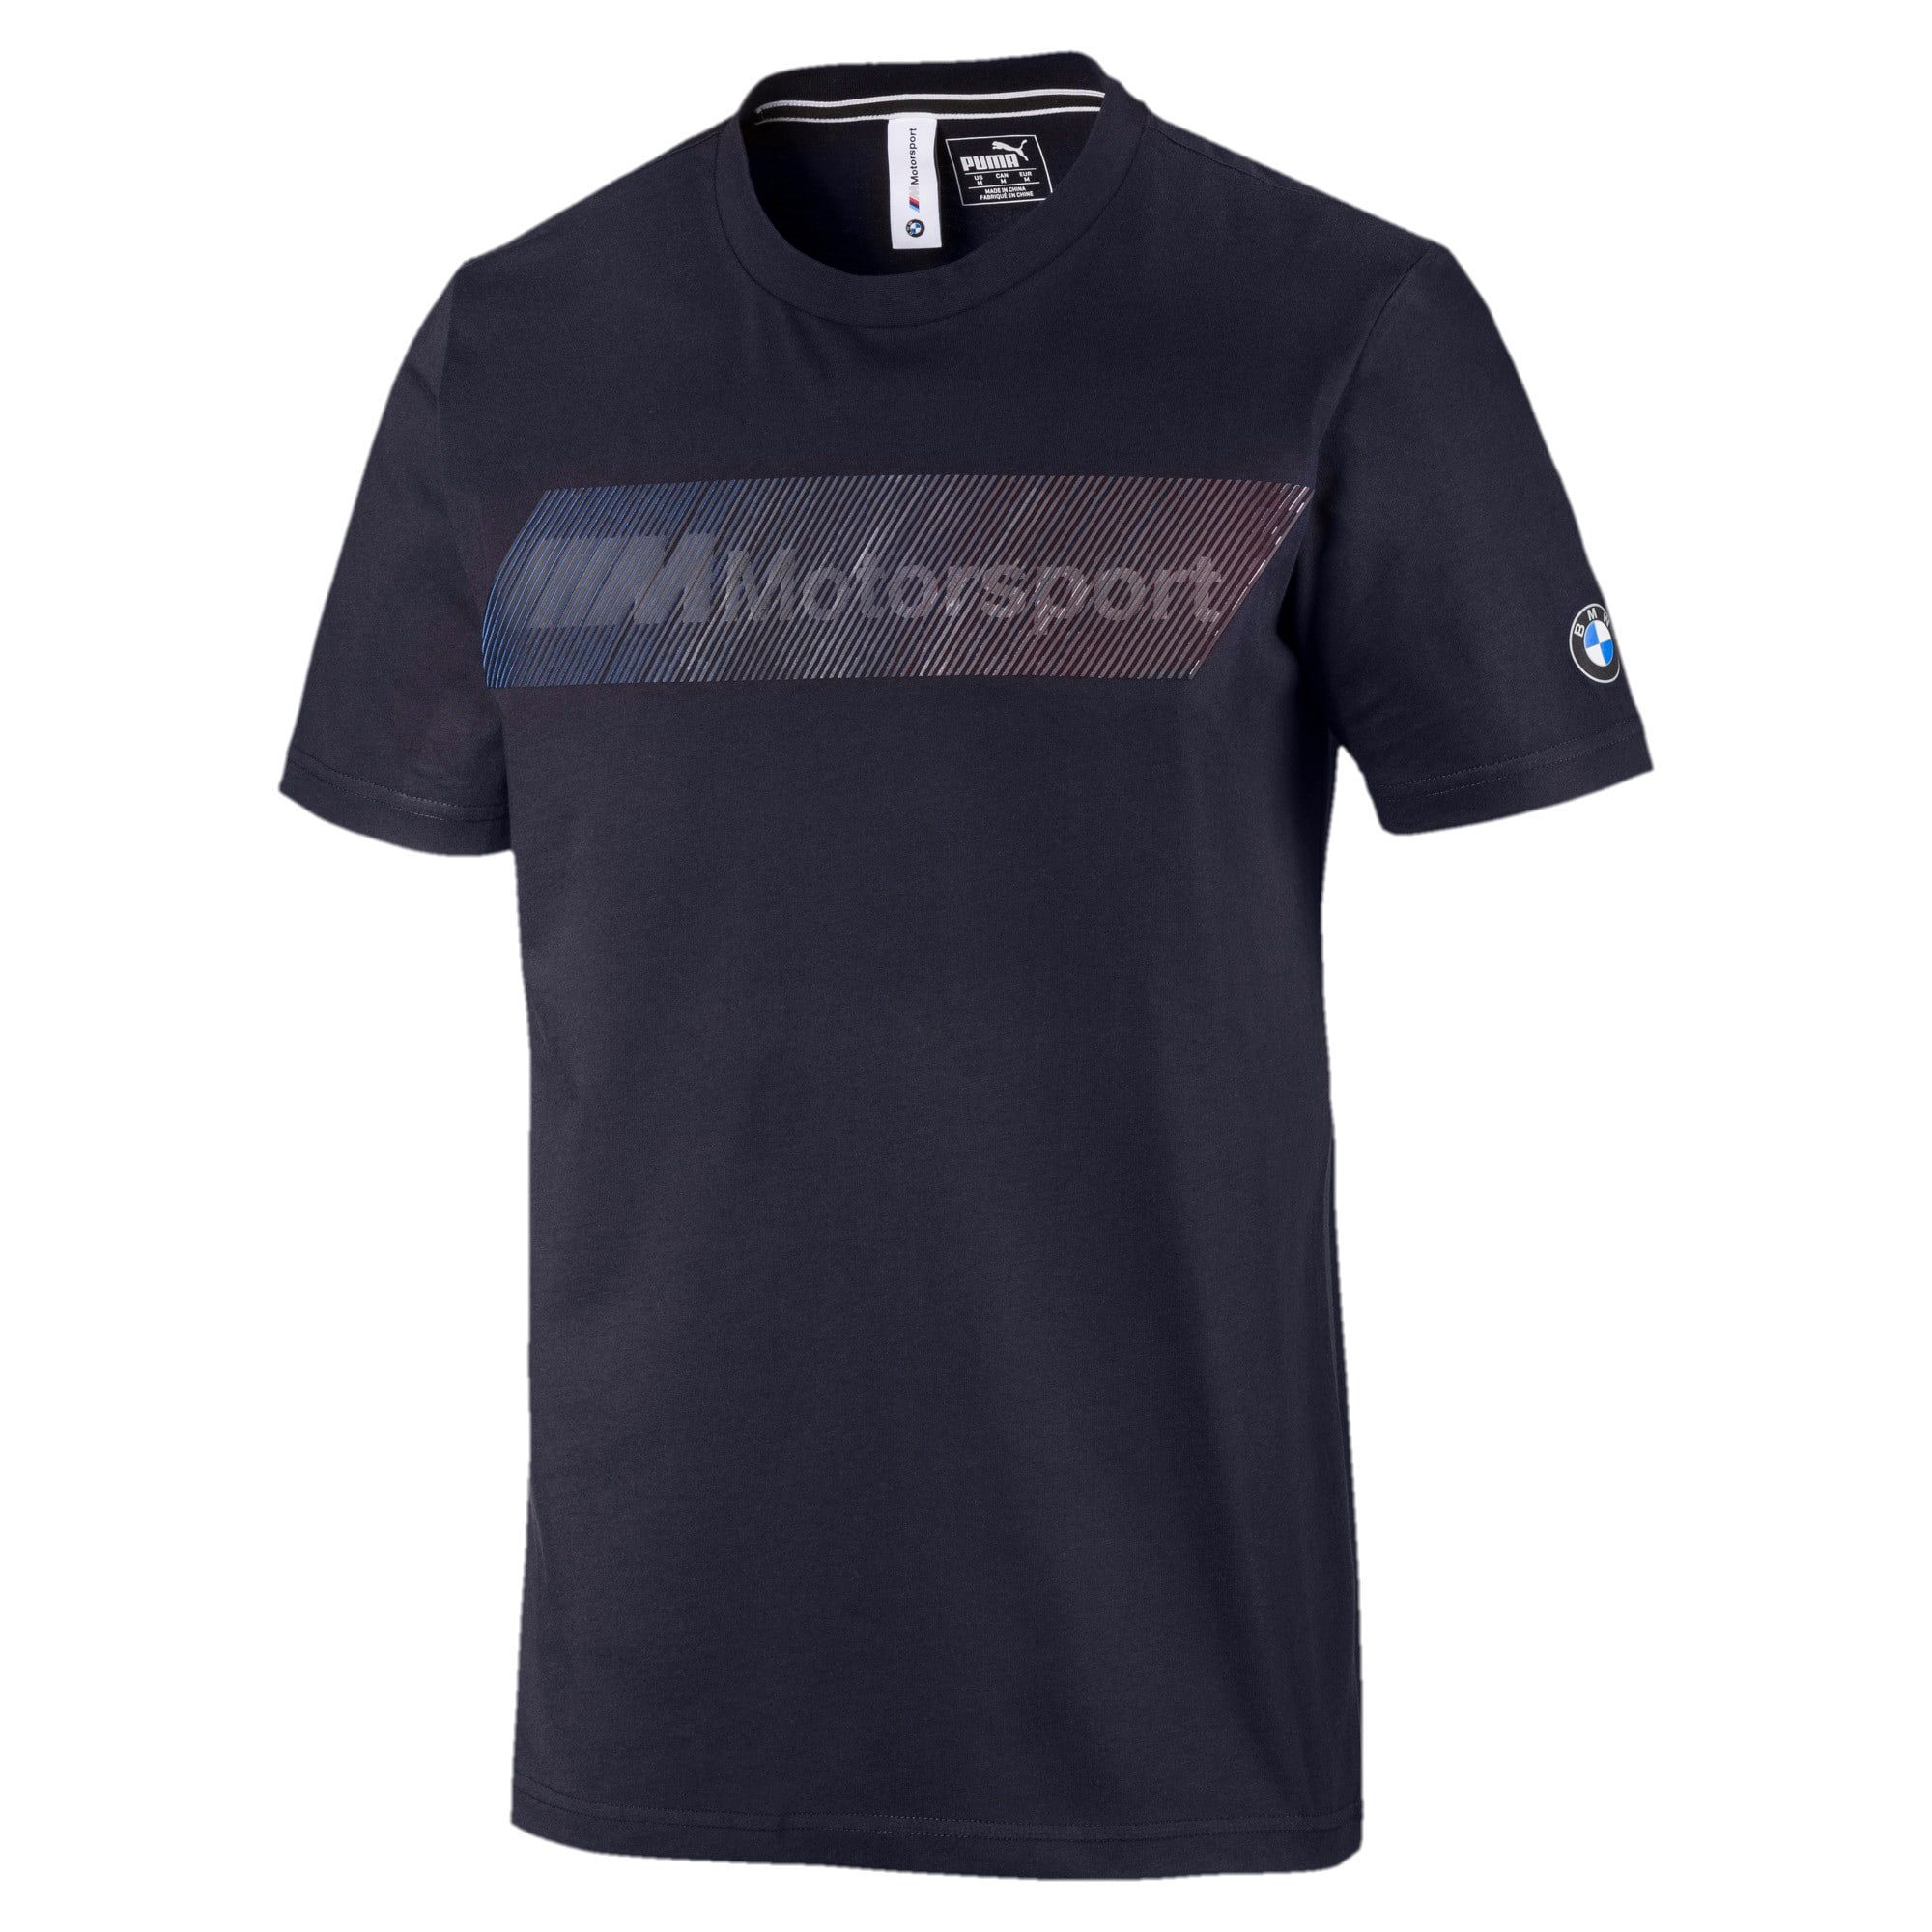 Thumbnail 1 of BMW M Motorsport Logo Men's Tee, Team Blue, medium